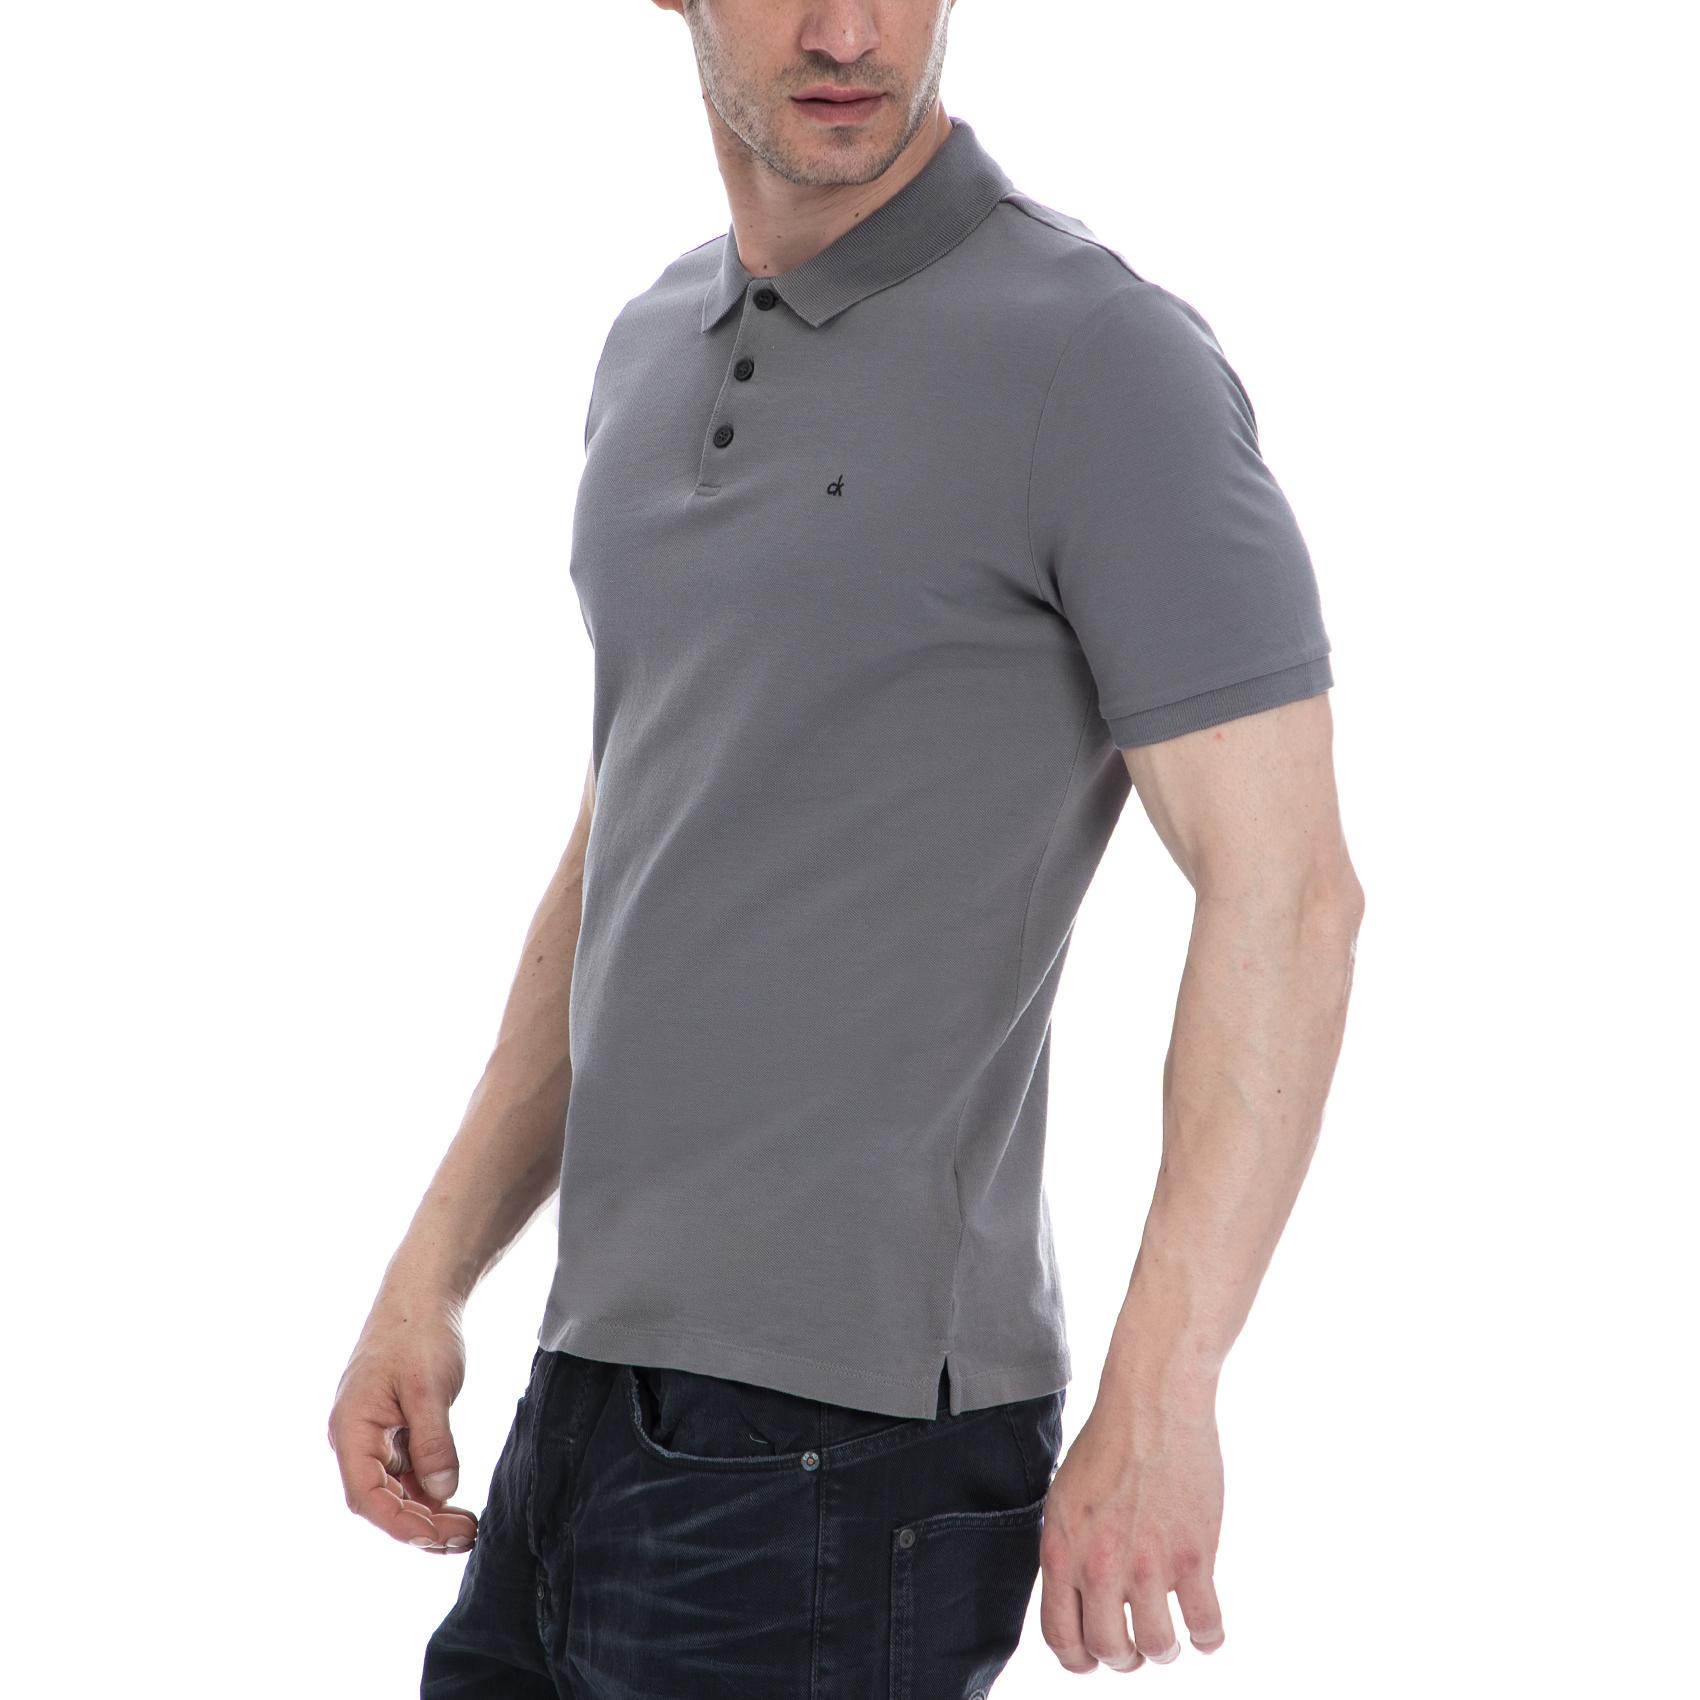 CALVIN KLEIN JEANS - Ανδρική μπλούζα Calvin Klein Jeans γκρι e696e918ee0